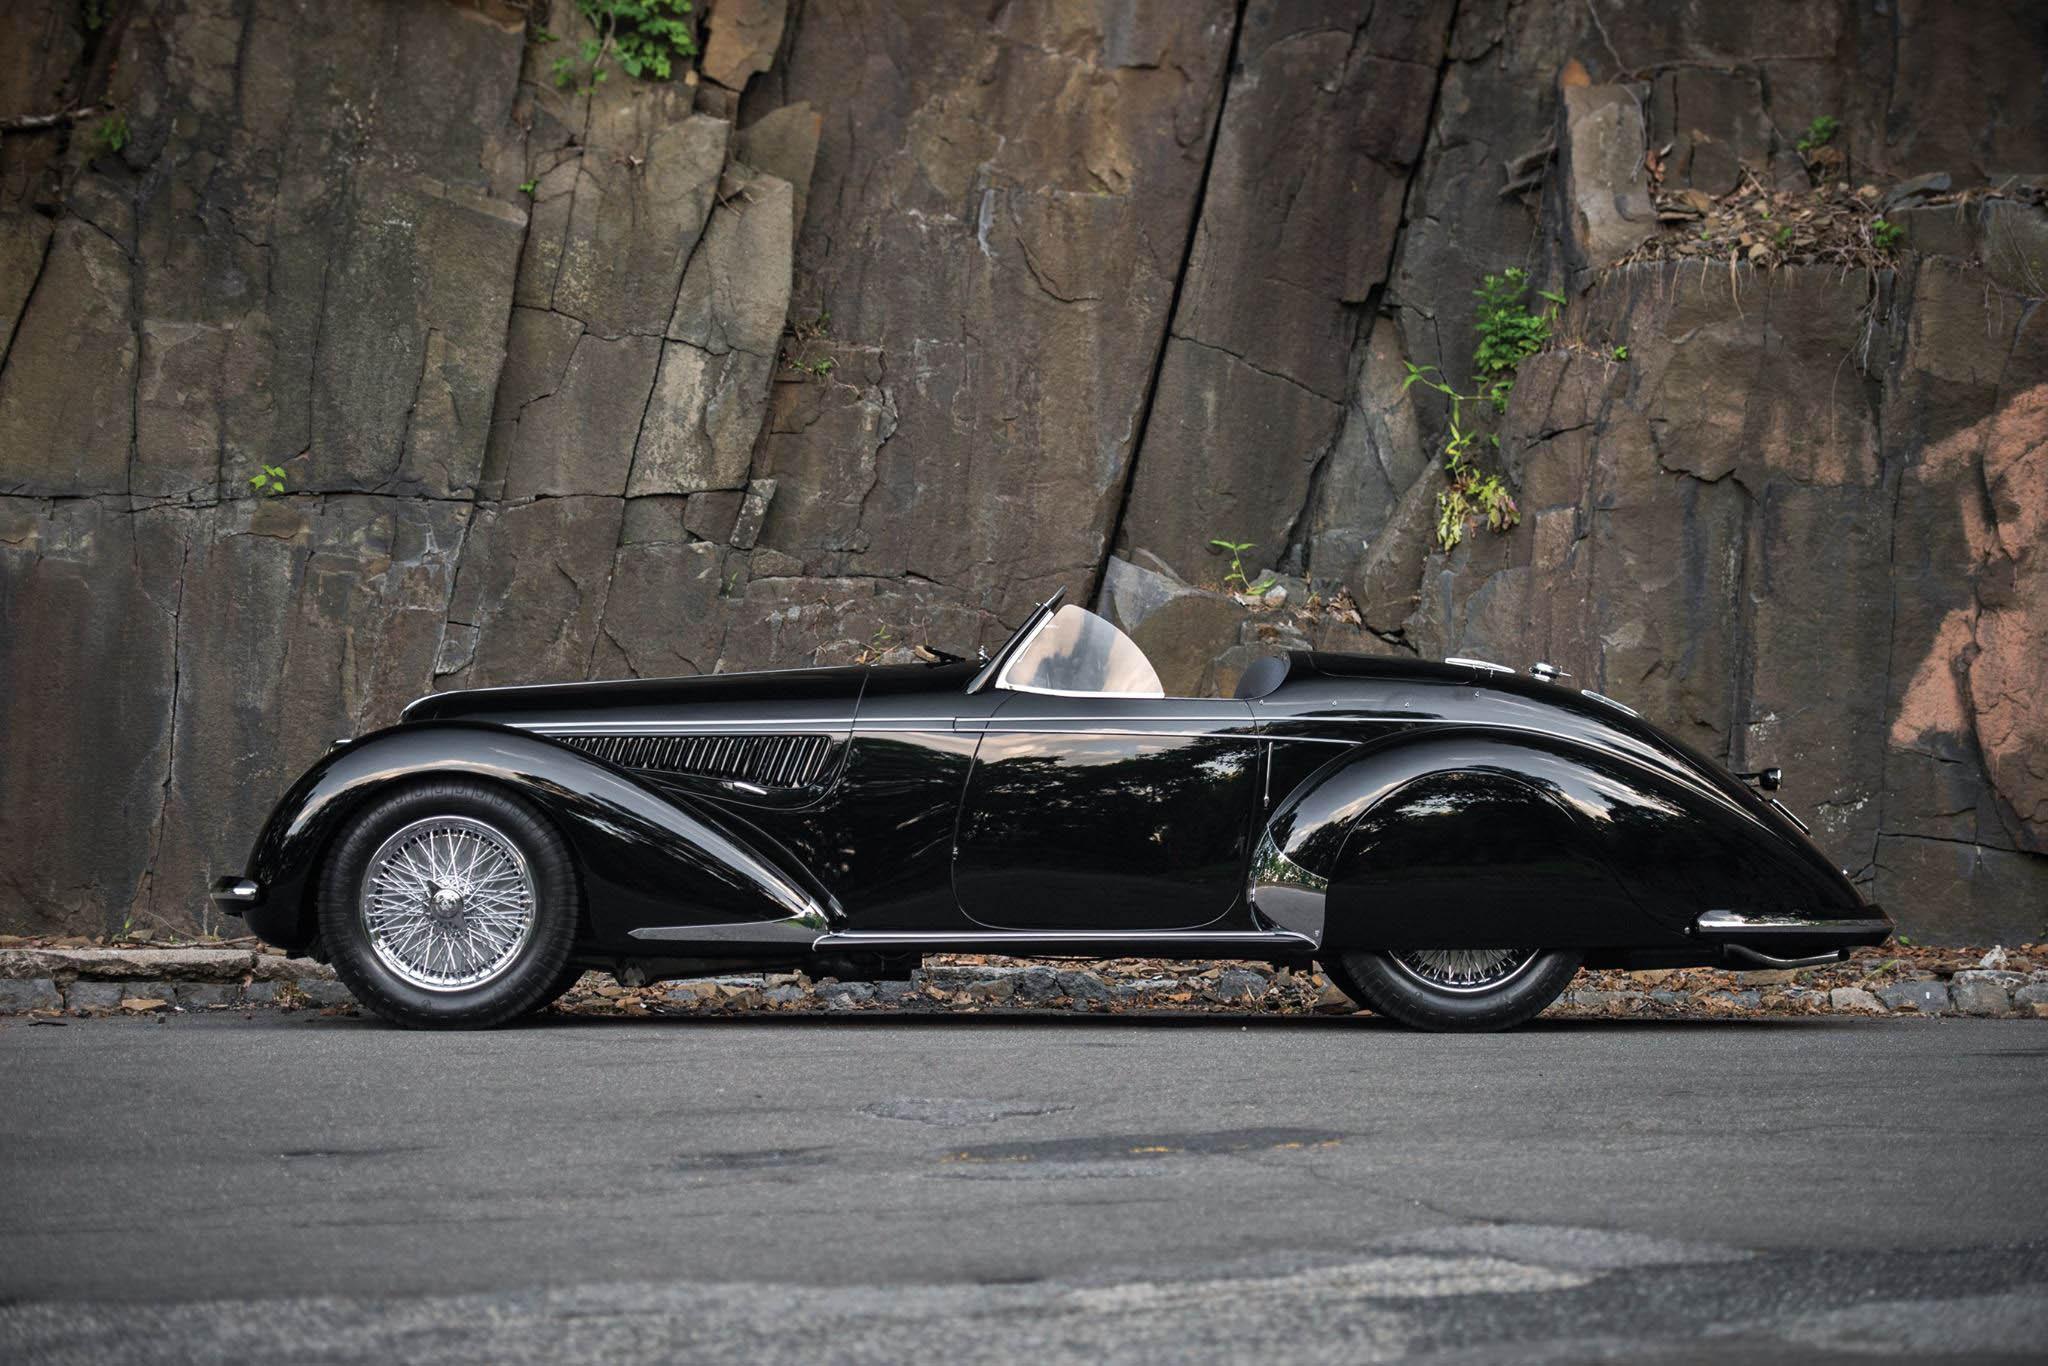 Alfa Romeo 8c 2900b Lungo Spider 1939 Sprzedana Gieda Klasykw Rear End Link Https Rmsothebyscom En Auctions Mo16 Monterey Lots R208 By Touring 381861